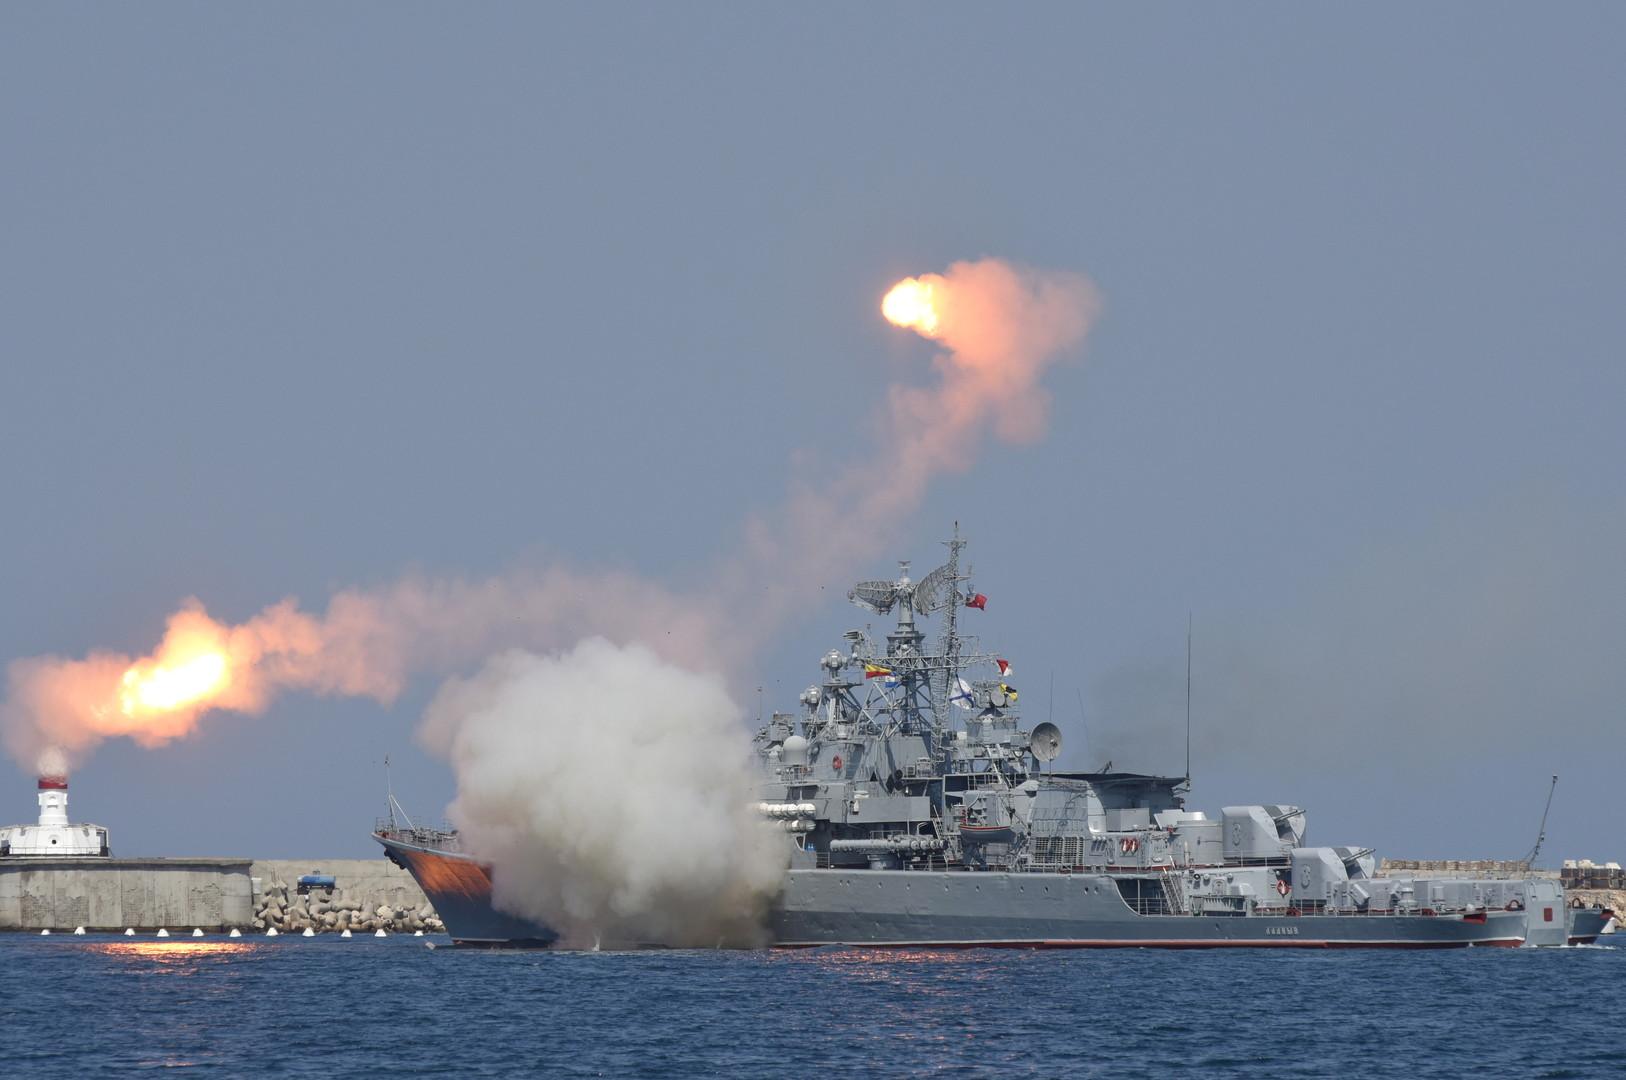 FT: Амбиции России в Чёрном море взволновали НАТО